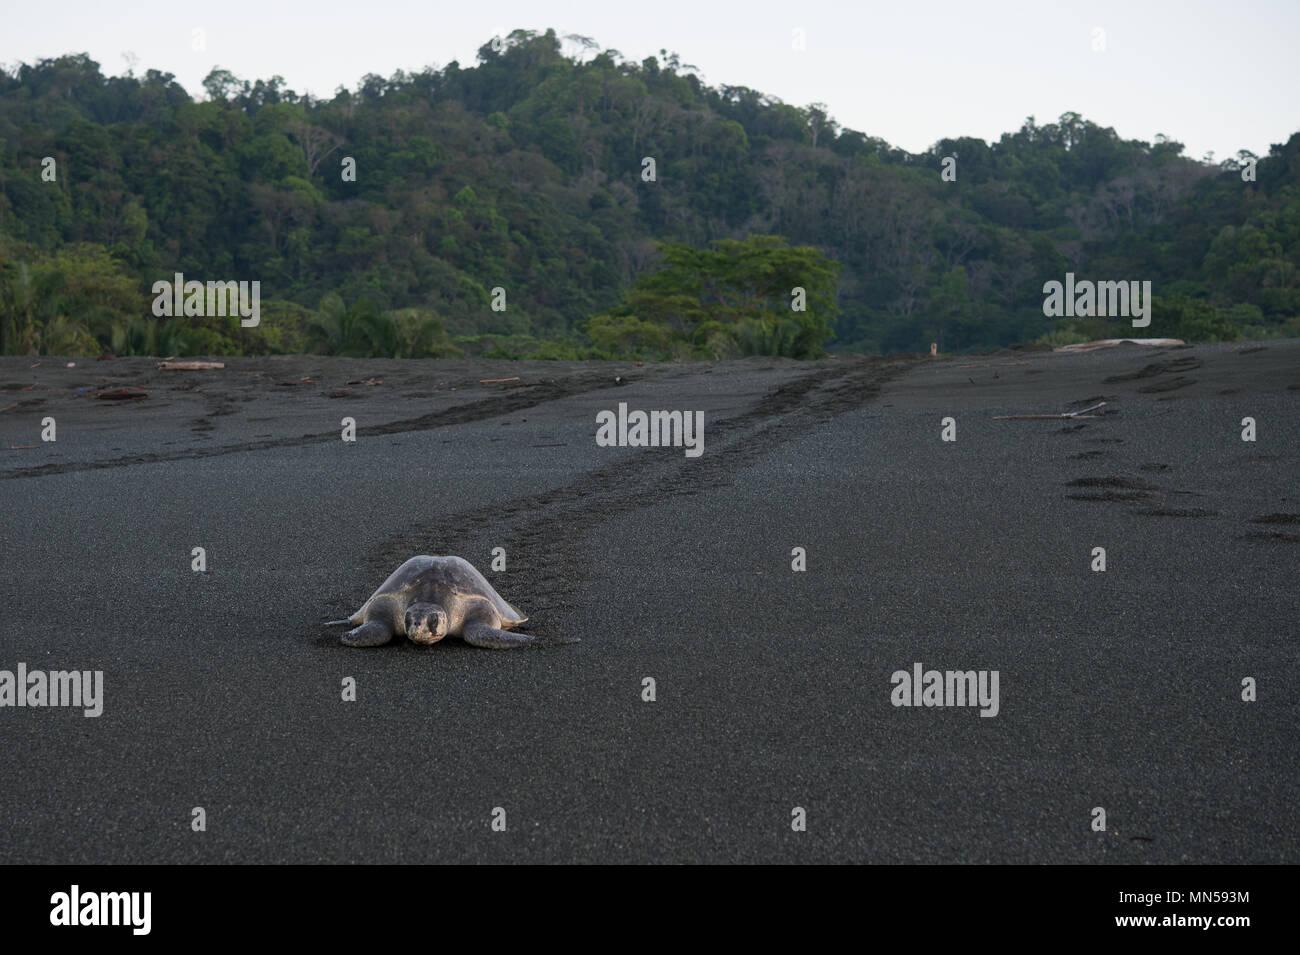 Olive Ridley Grüne Schildkröte, Lepidochelys olivacea, während der Laichzeit, Cheloniidae, Karate Strand, Corcovado National Park, Costa Rica, Centroamerica Stockbild